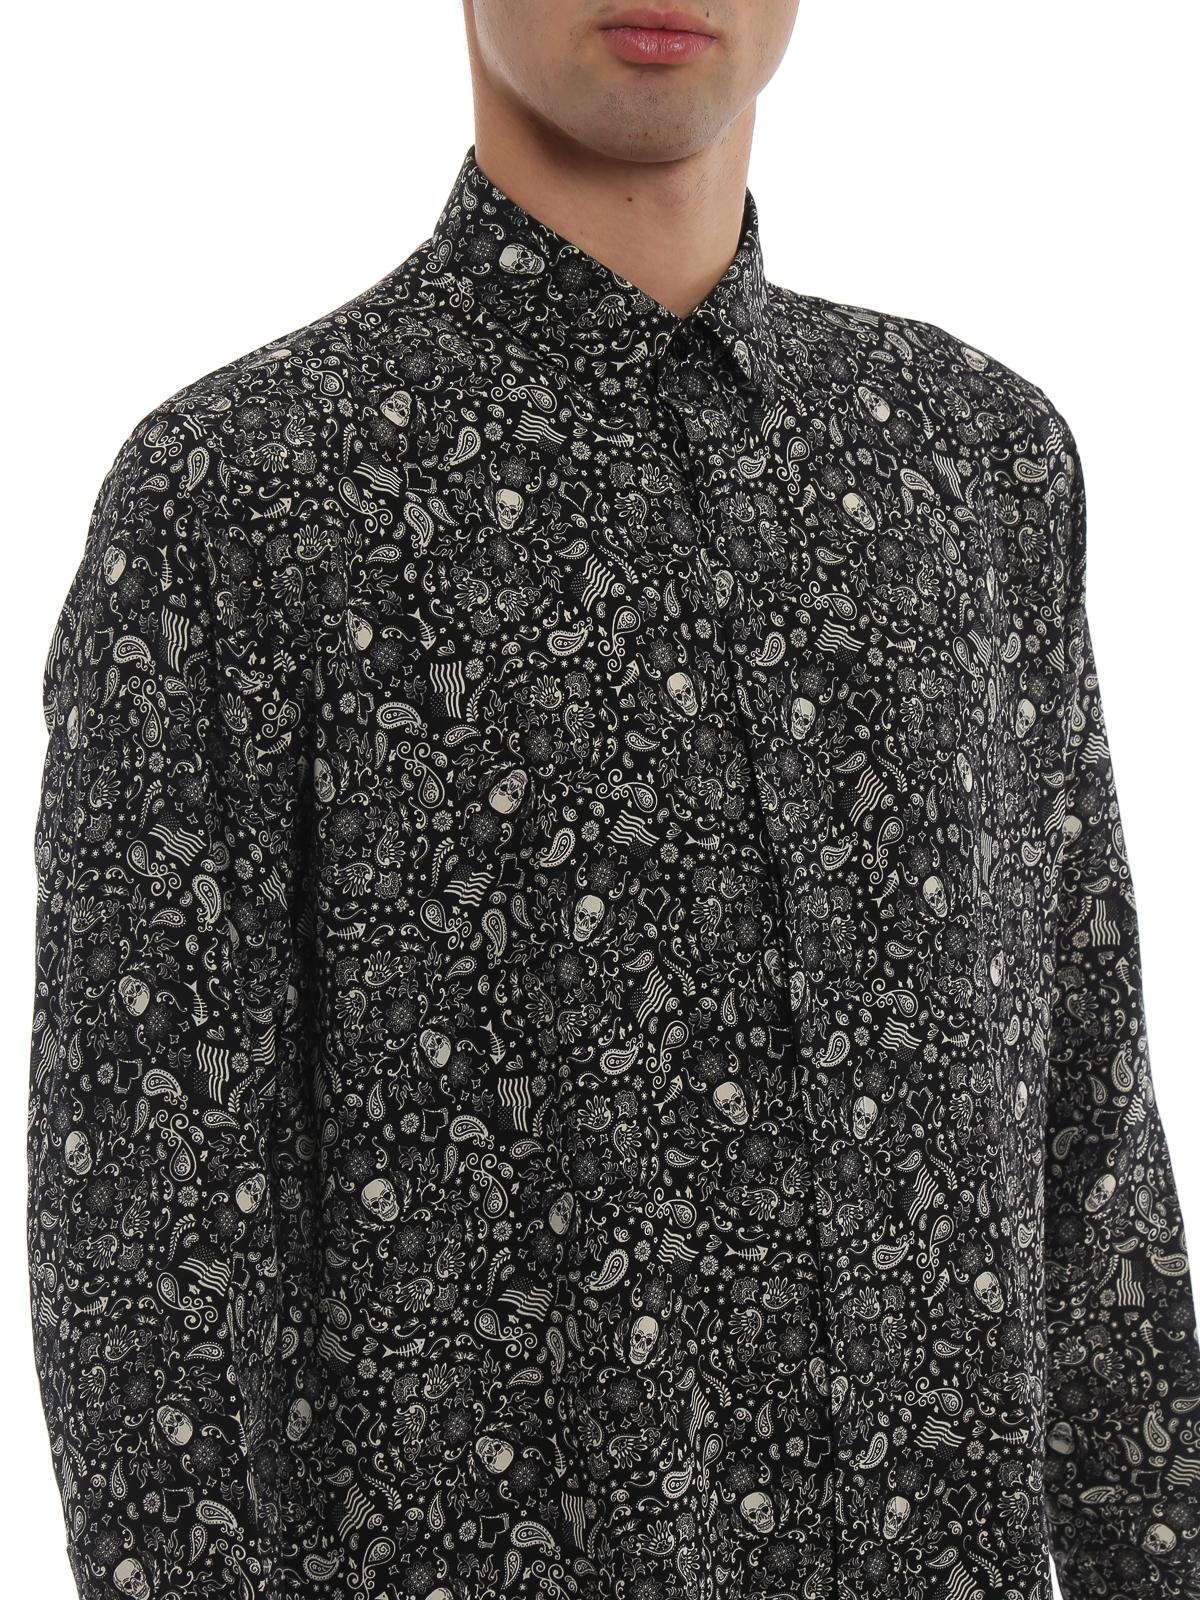 1e213413204 Saint Laurent - Silk crepe de chine Skull shirt - shirts ...